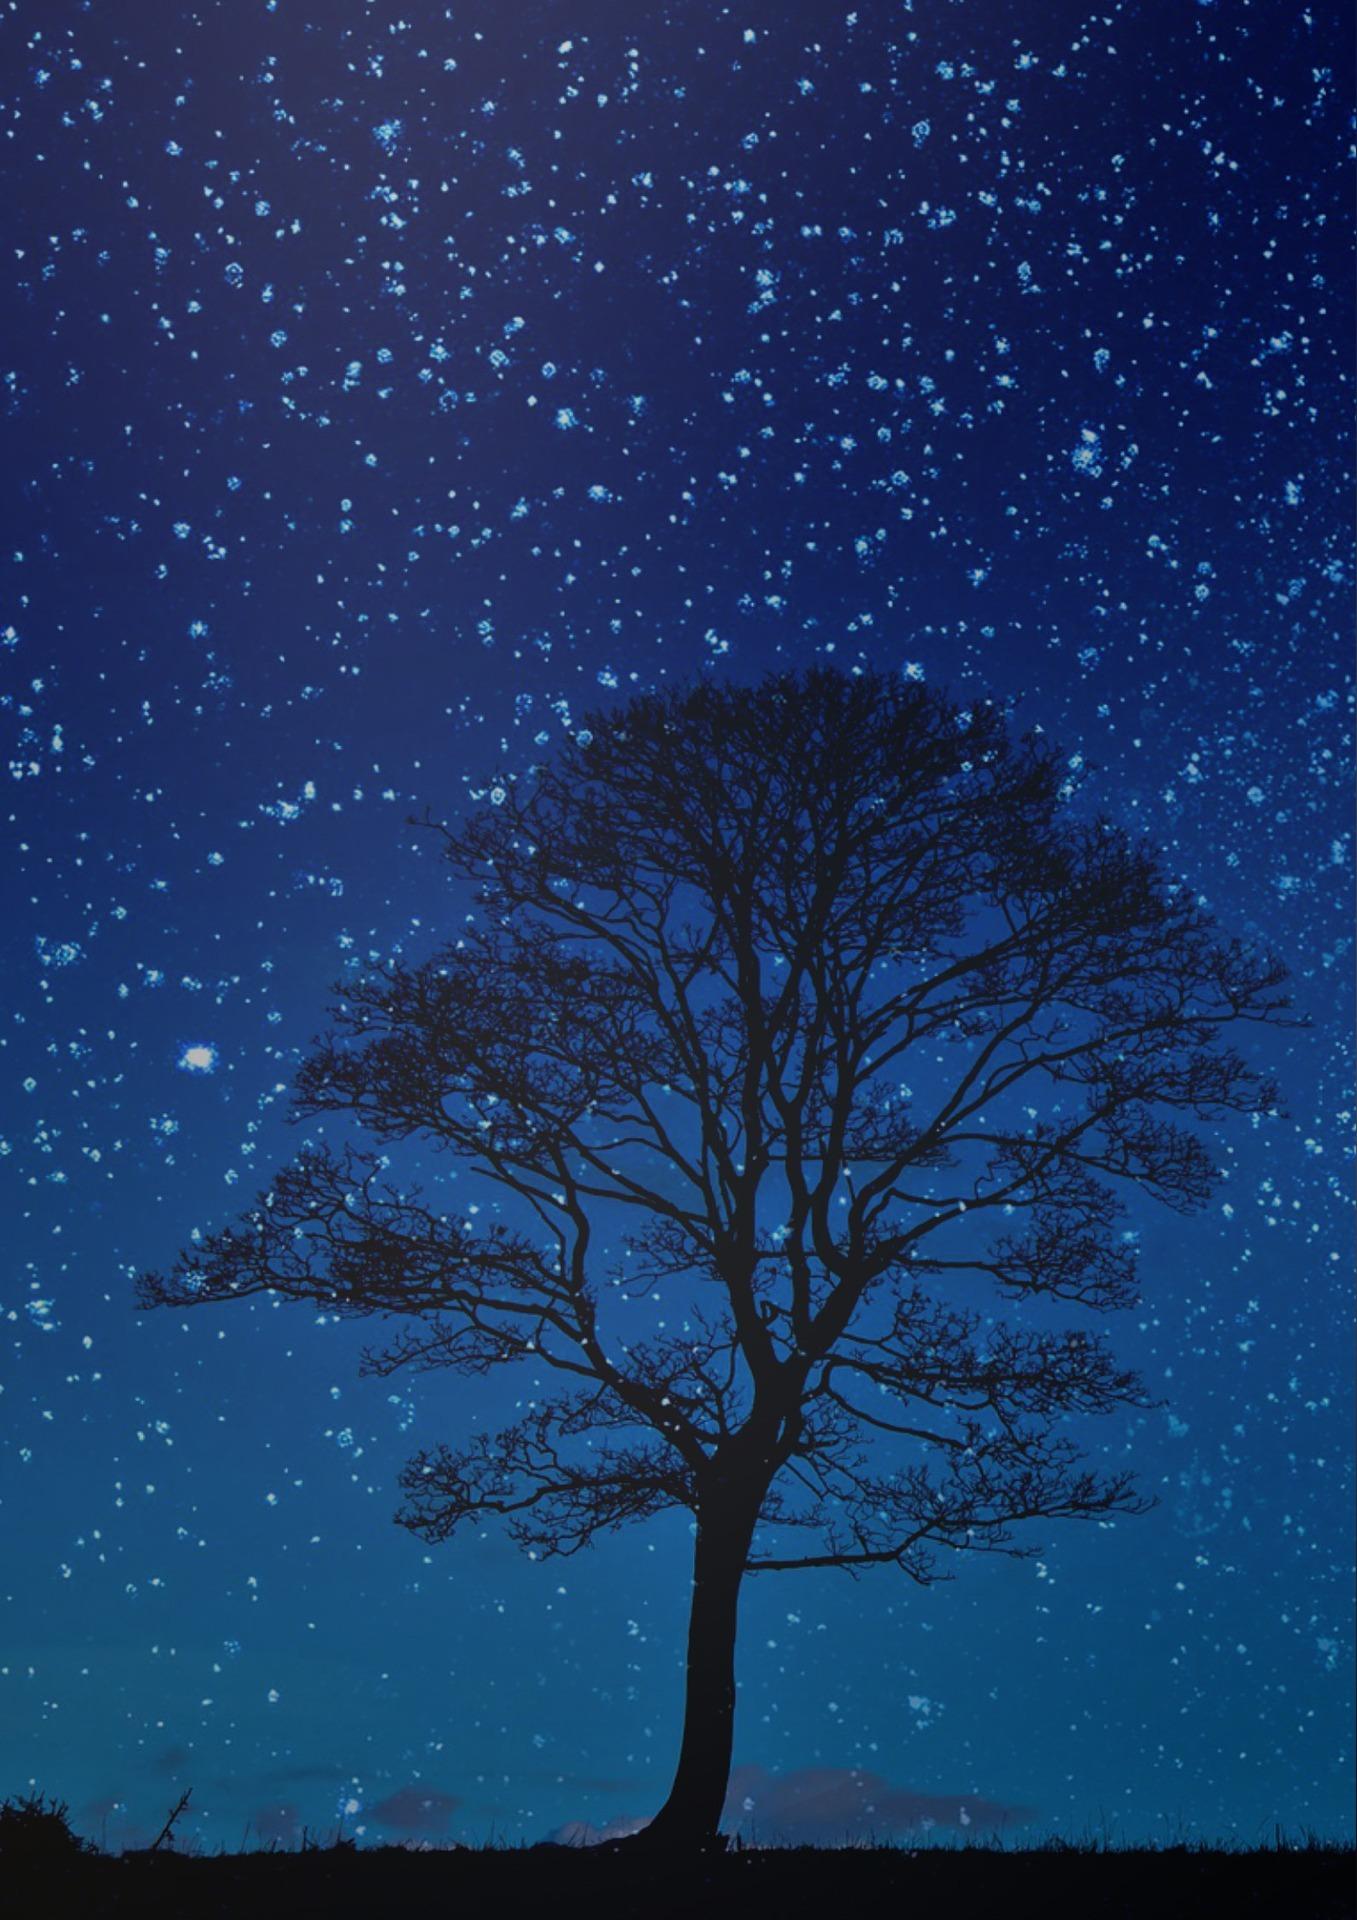 night-1808524_1920.jpg